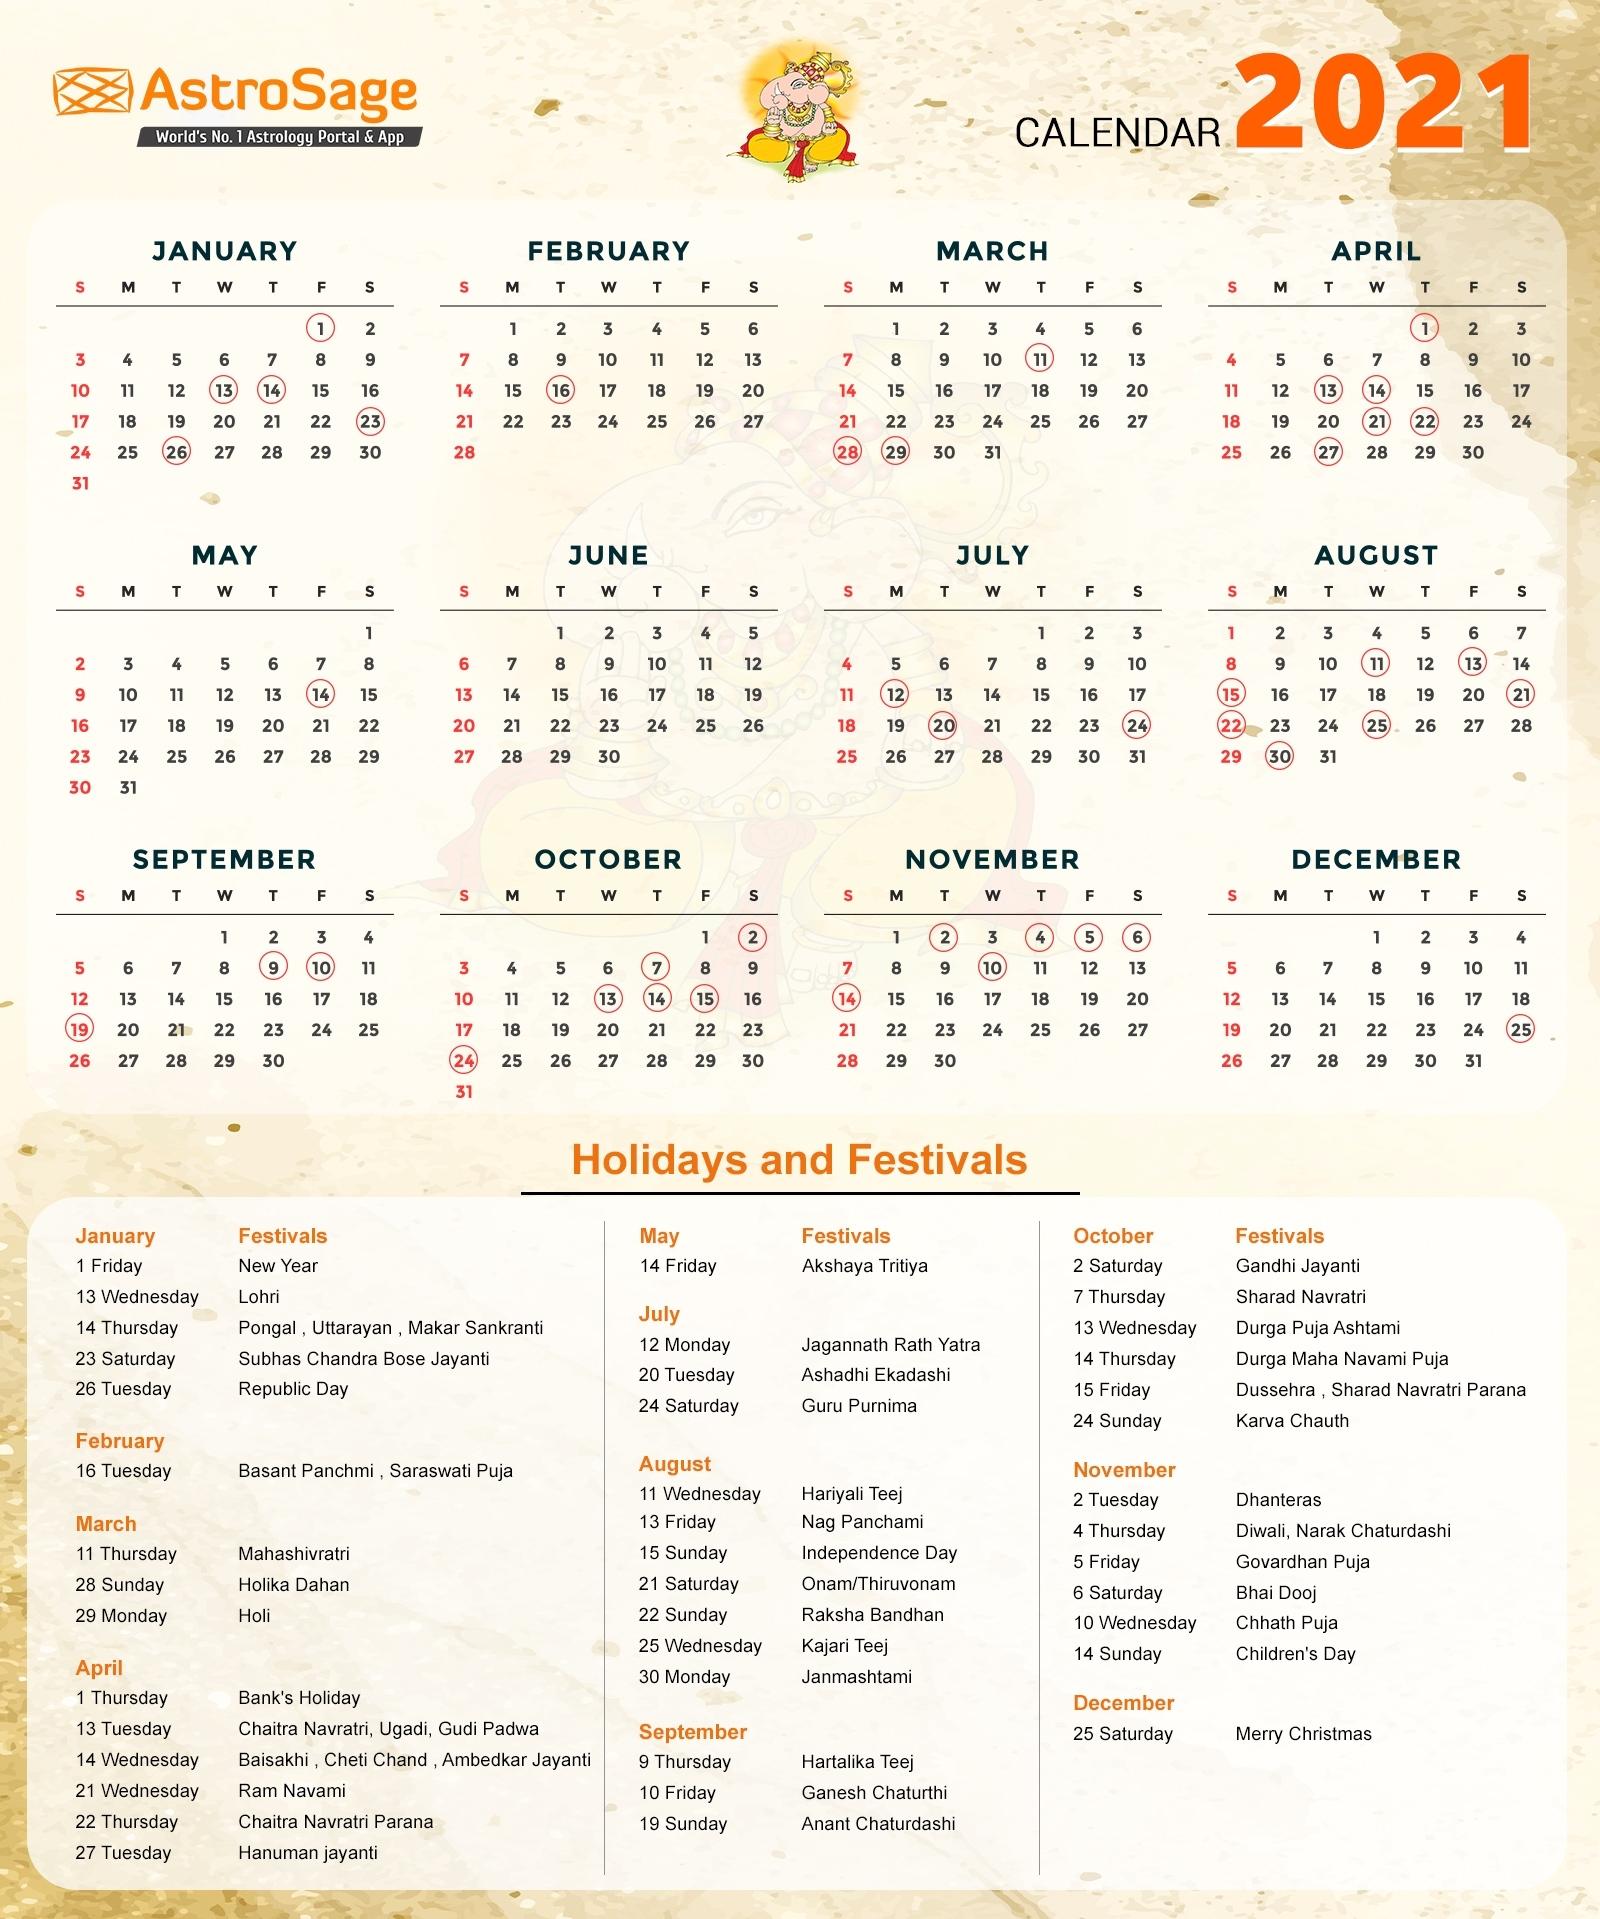 Indian Calendar 2021 - Indian Festivals & Holidays 25 June 2021 Islamic Calendar